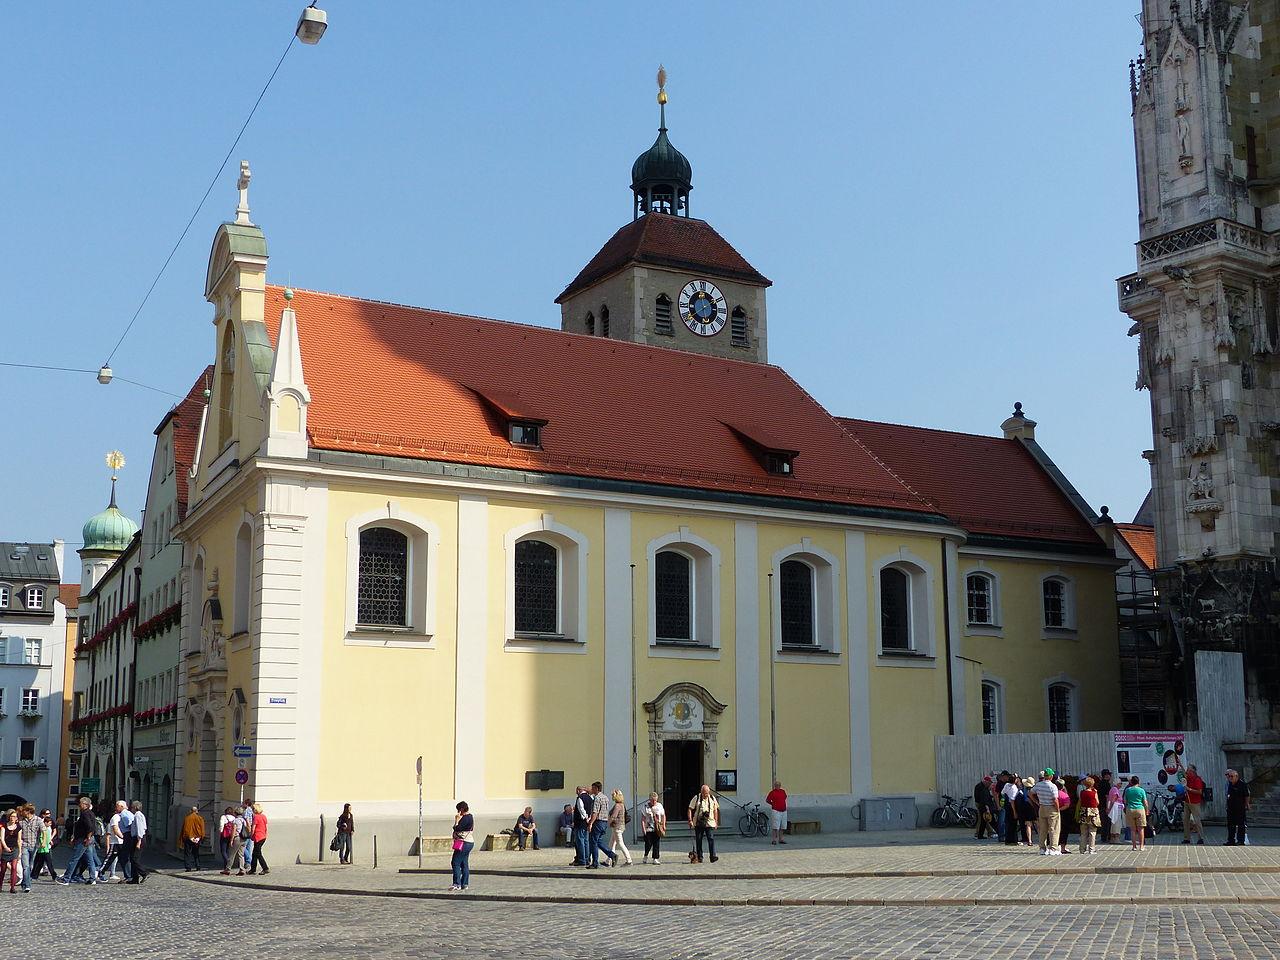 Bild Stiftskirche St. Johann Regensburg